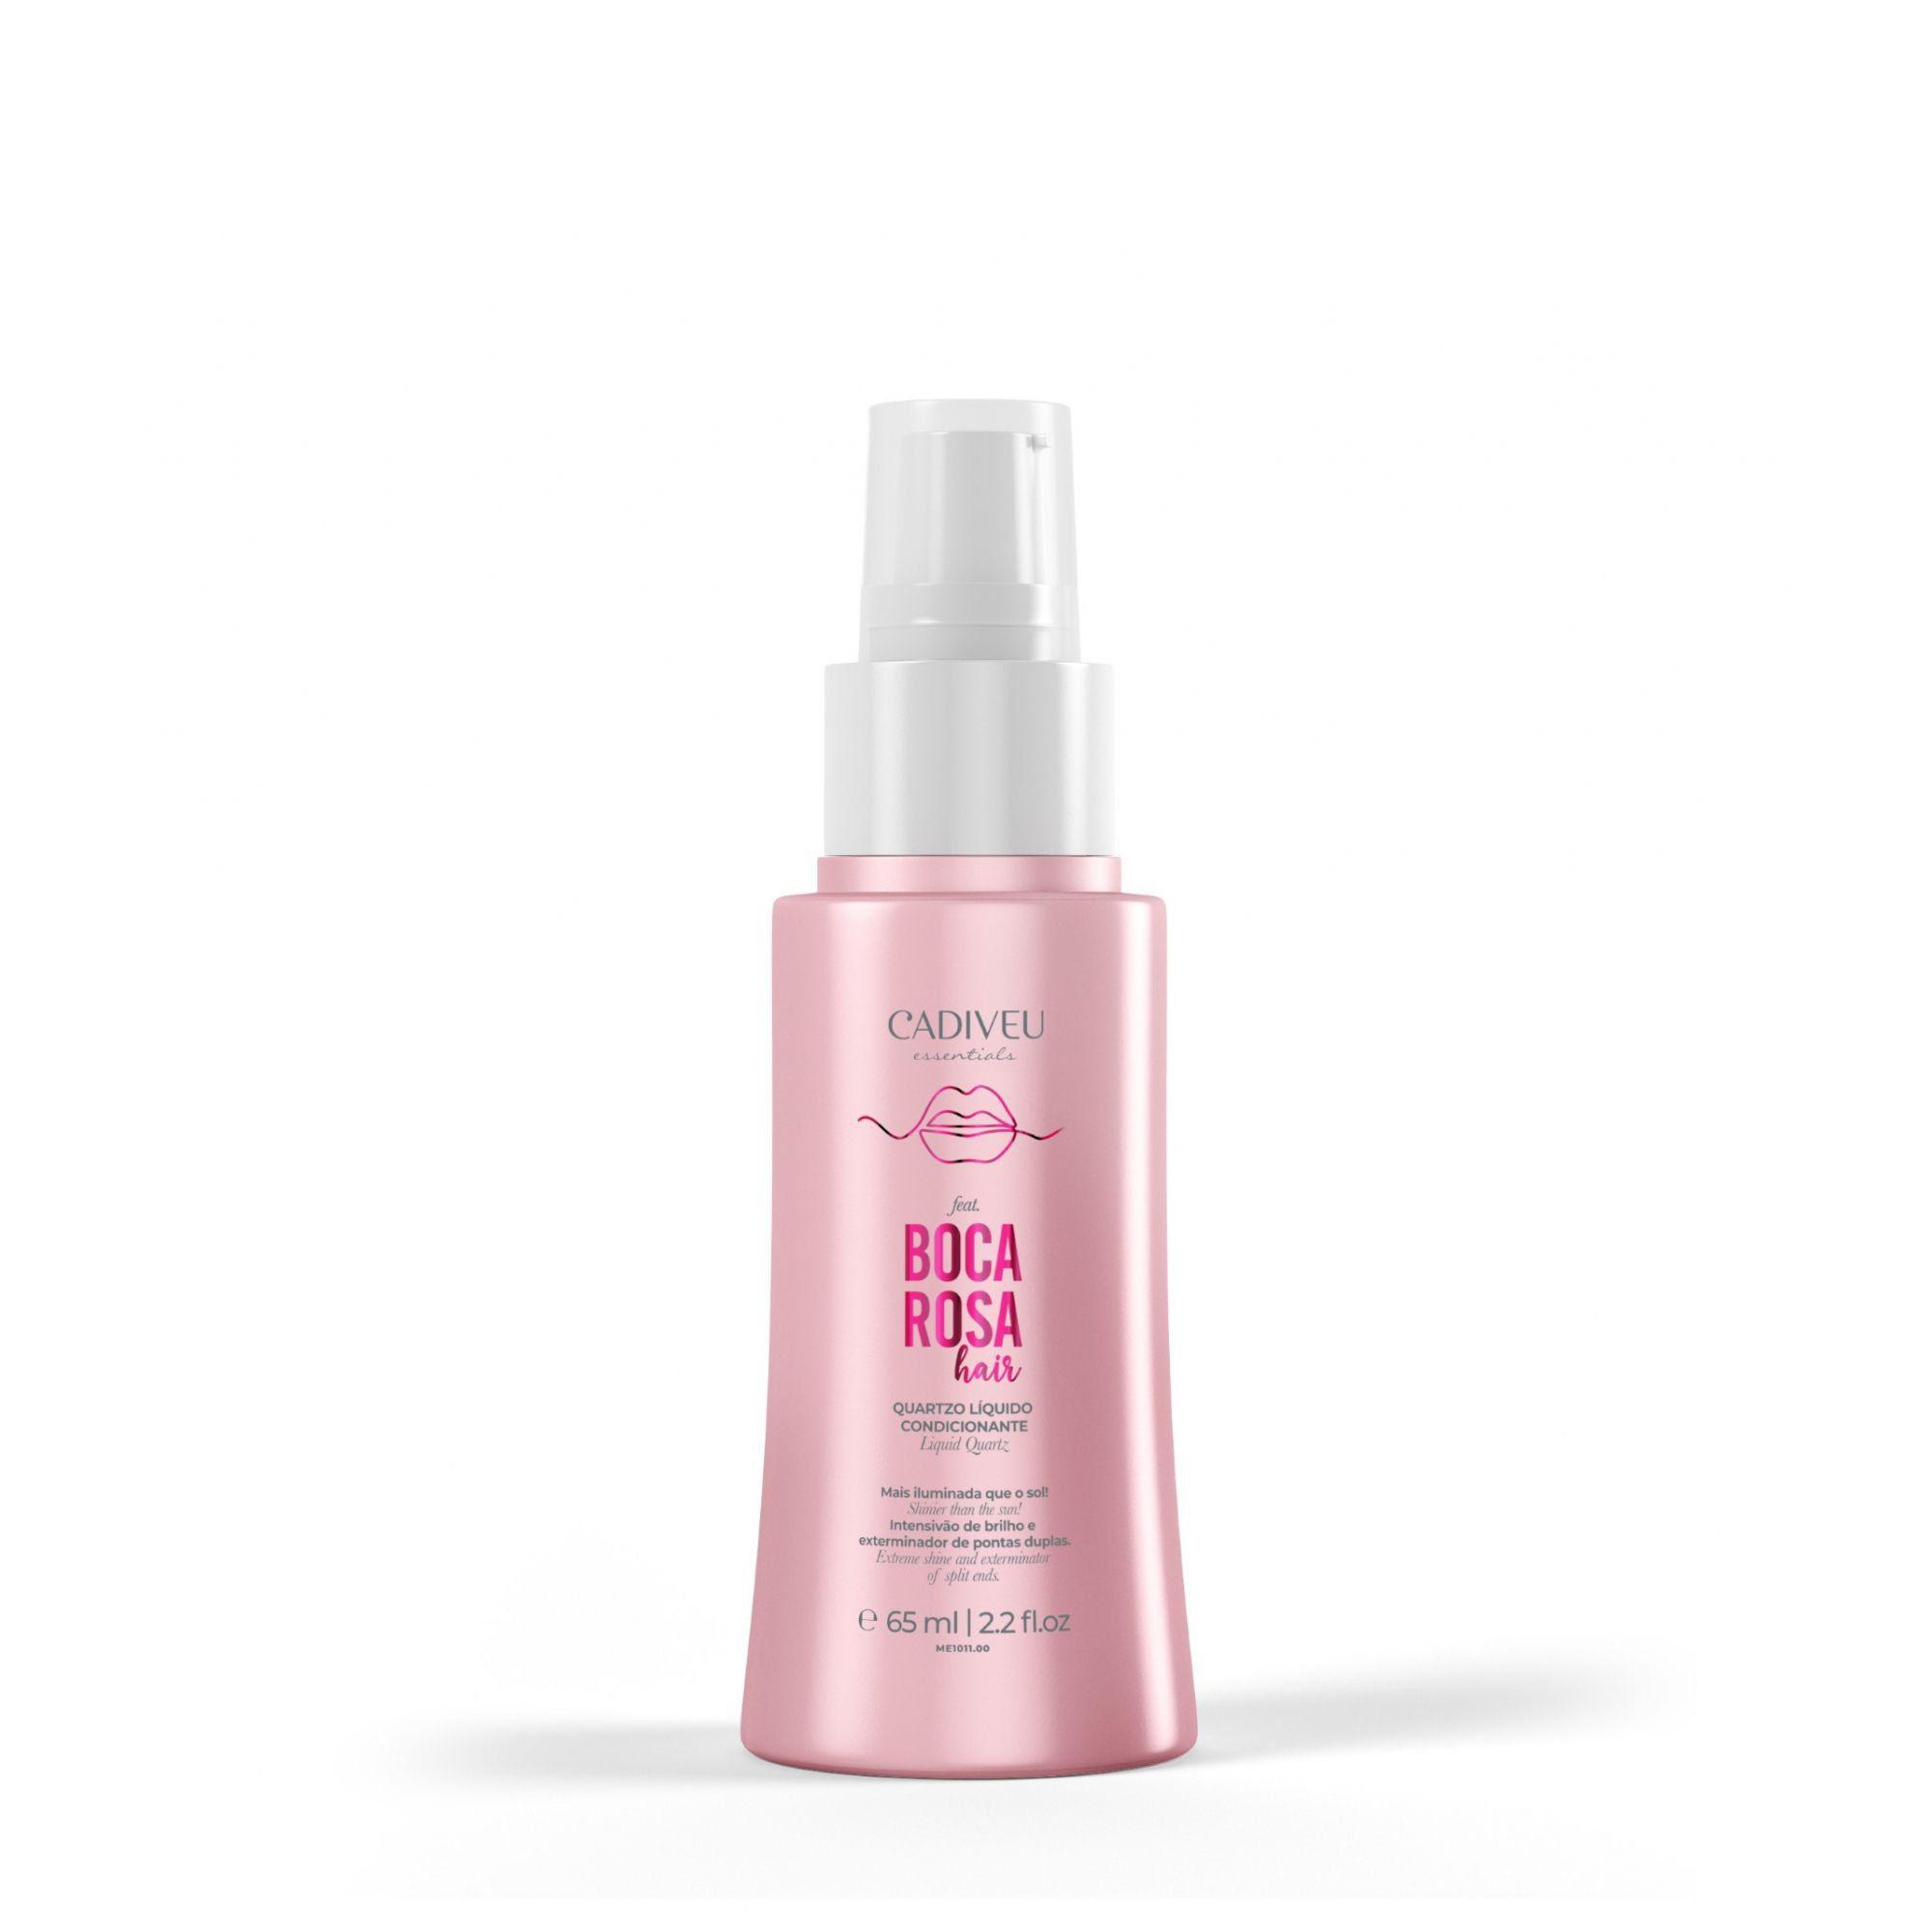 Cadiveu Boca Rosa Hair Sérum Líquido Condicionante de Quartzo - 65ml